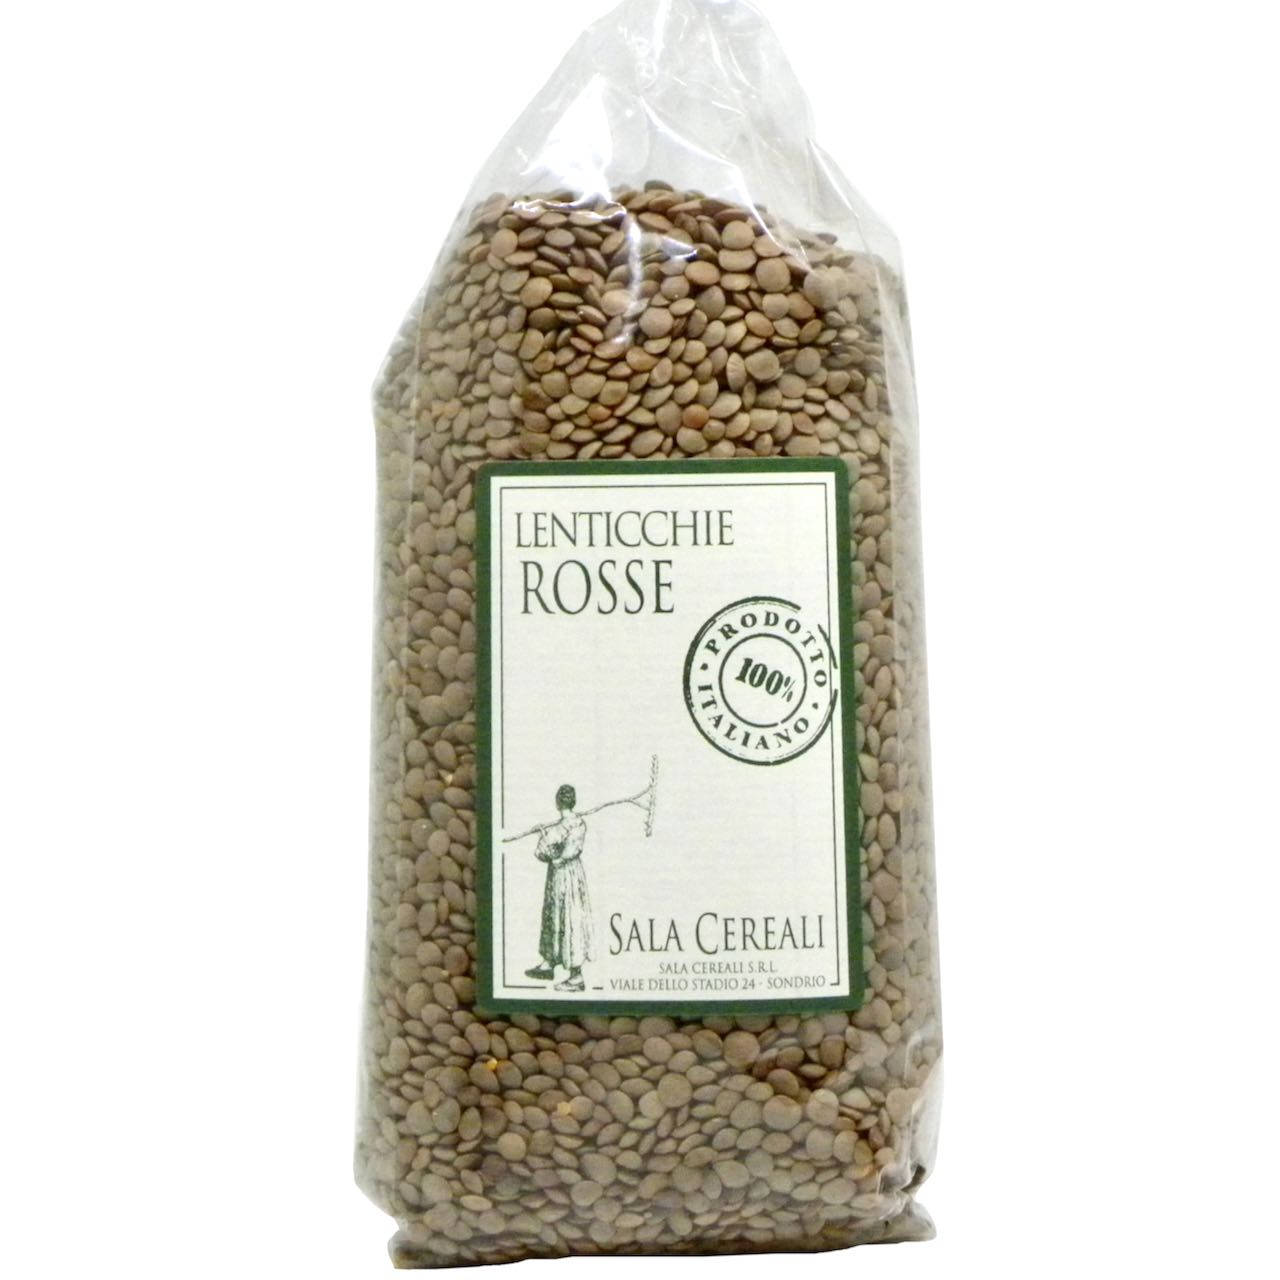 lenticchie rosse Sala Cereali – Gustorotondo – buono sano artigiano